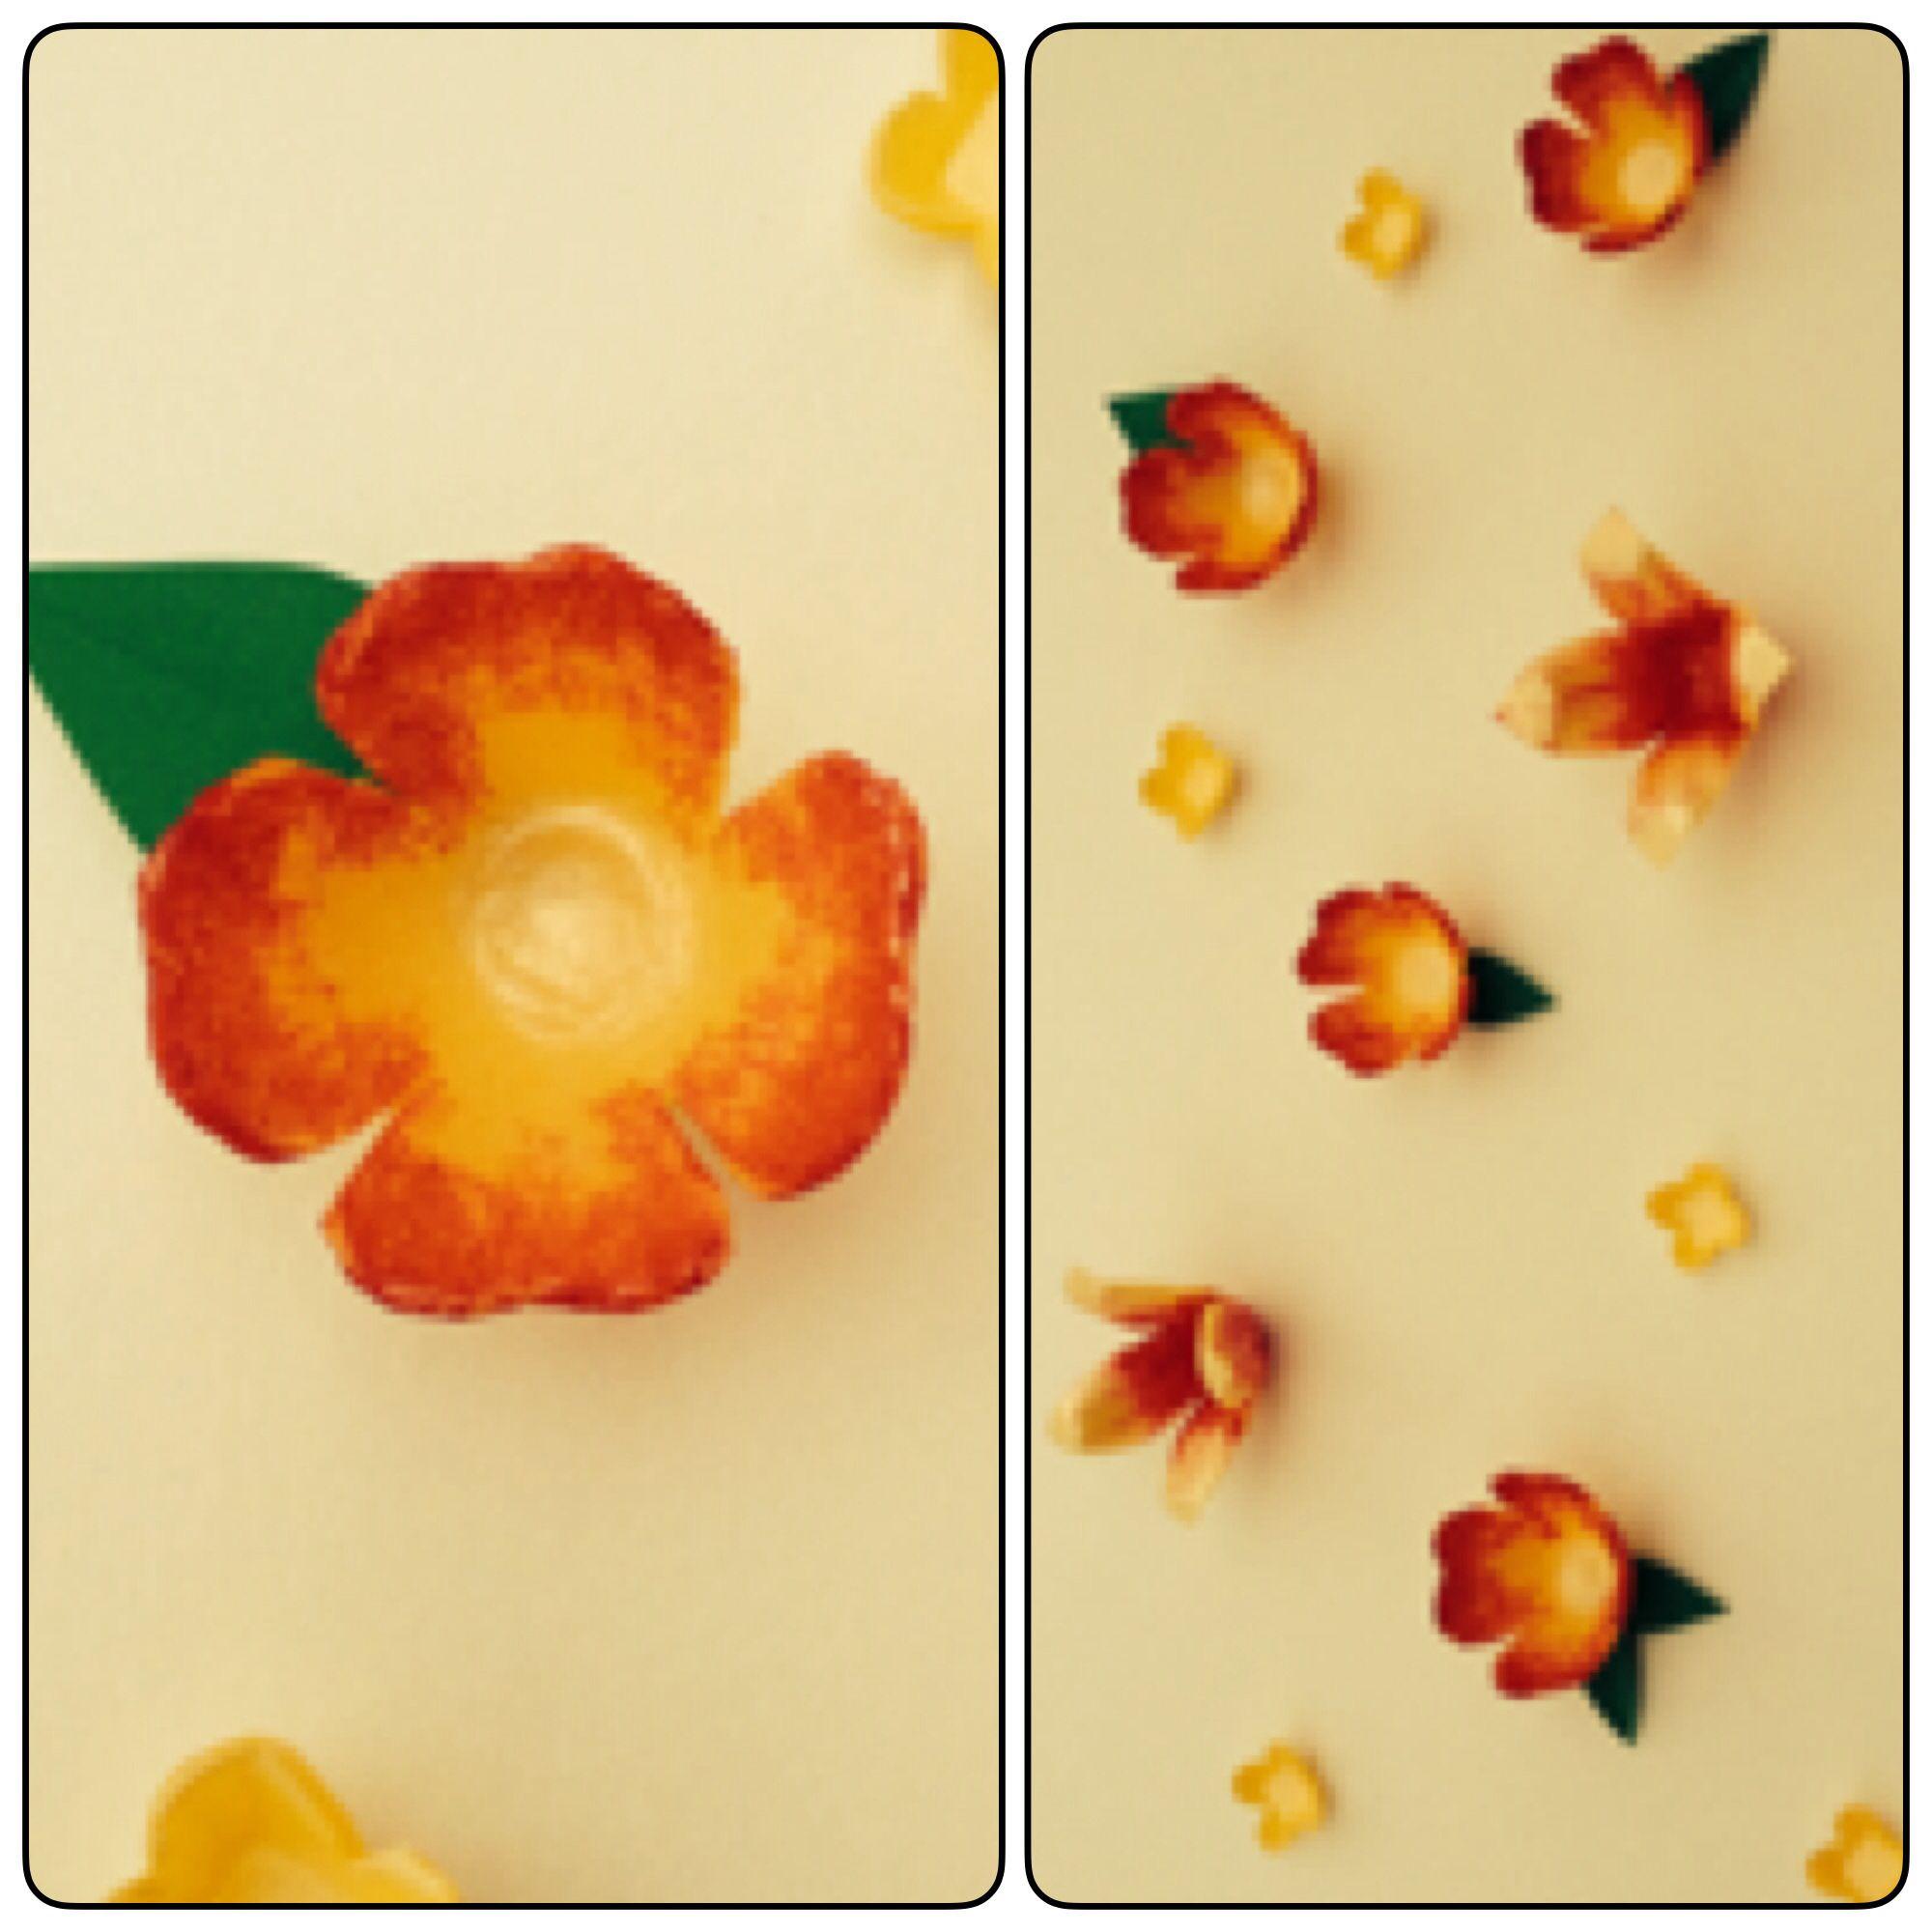 Styrofoam Egg Carton Flower Art Cut Out Flowers And Added